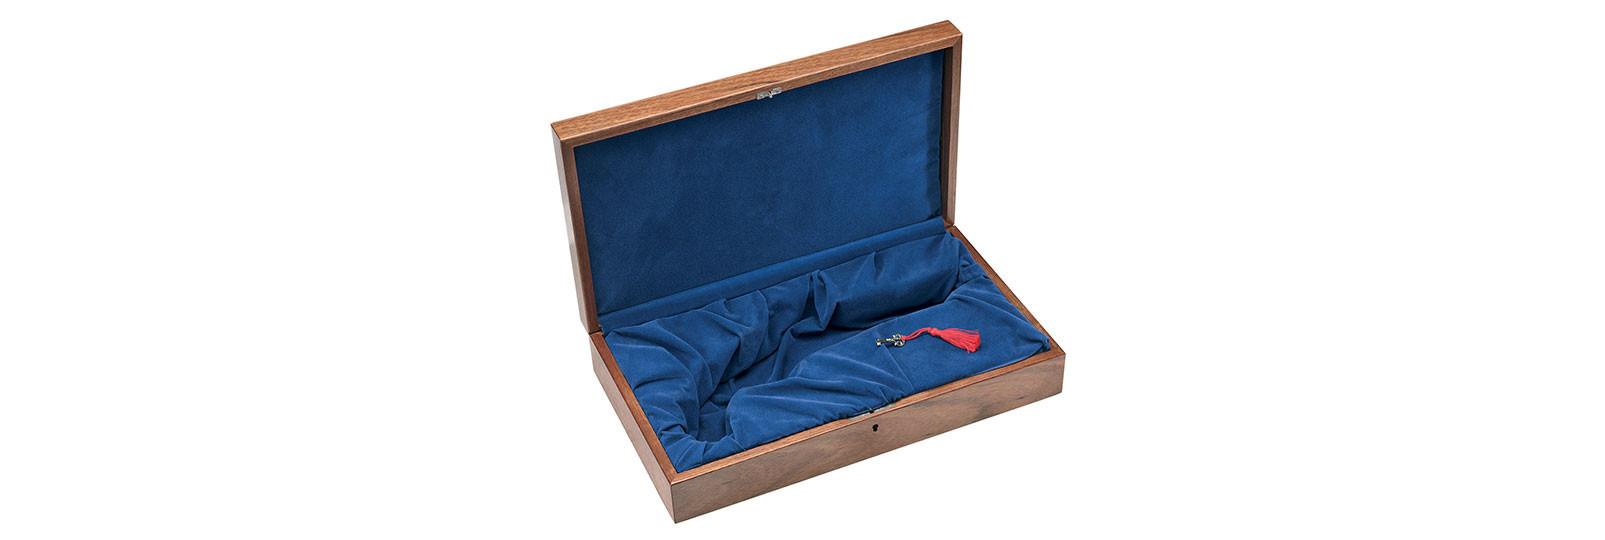 Mahogany case for pistol